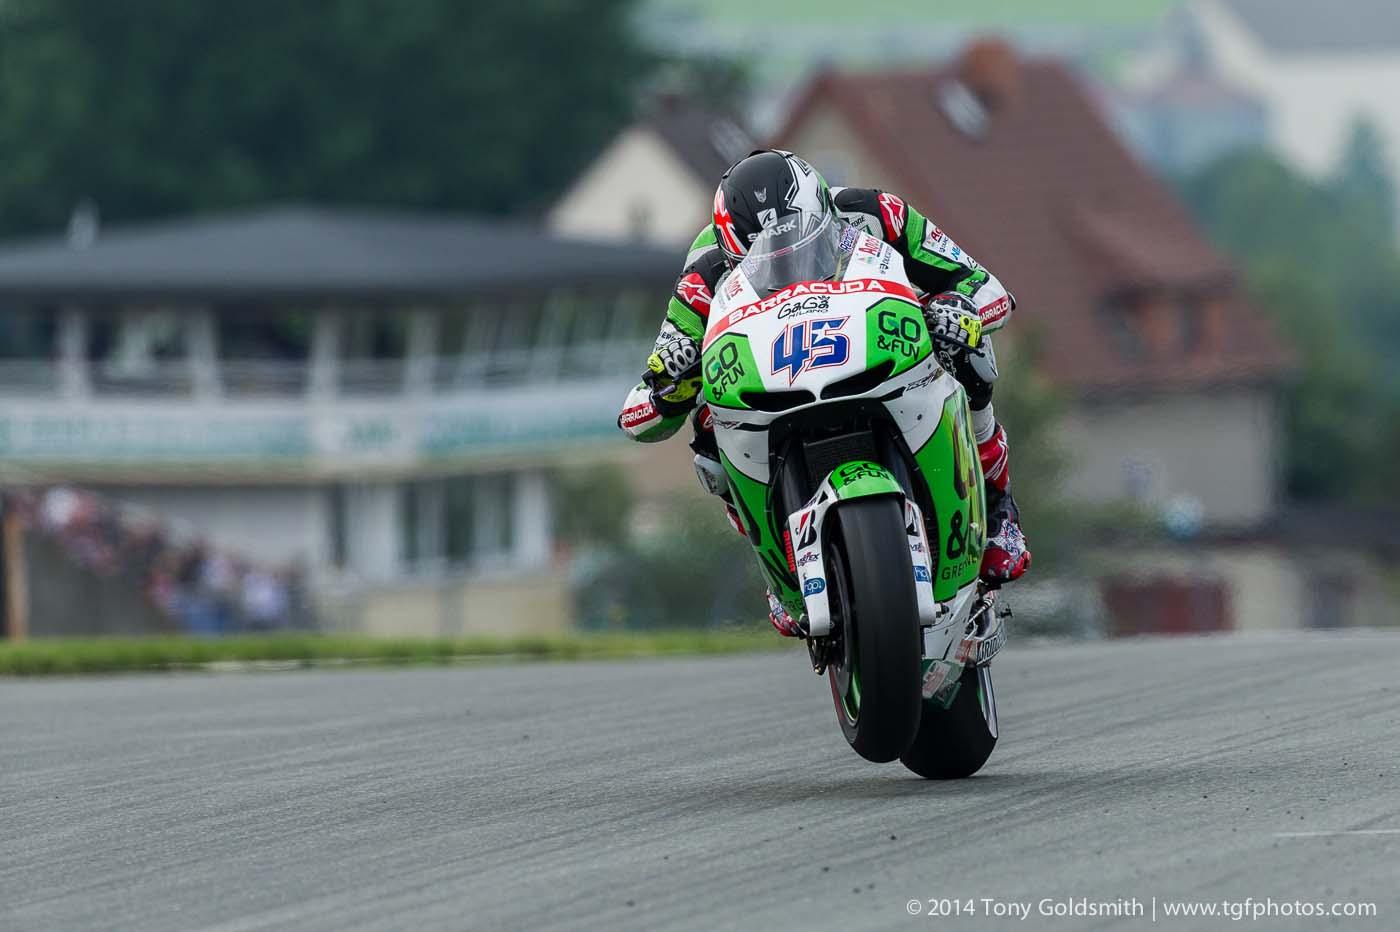 [GP] Sachsenring Saturday-Sachsenring-MotoGP-German-GP-Tony-Goldsmith-07